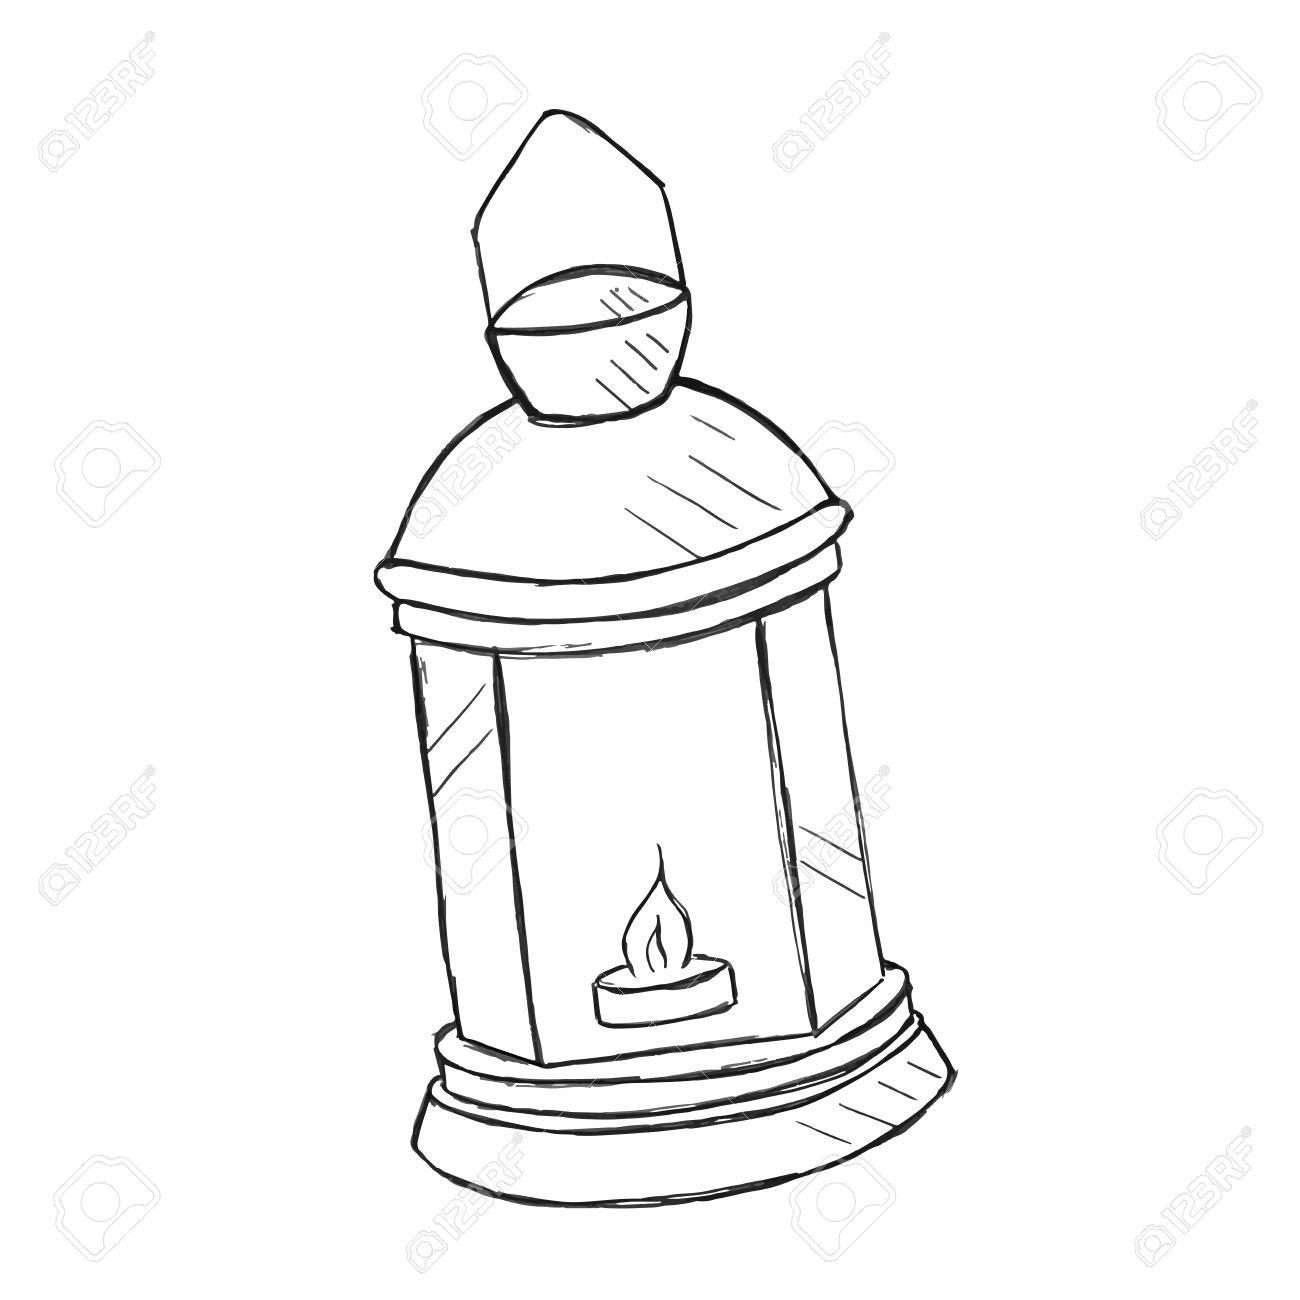 1300x1300 Vector Hand Drawn Kerosene Lamp, Doodle Style Royalty Free